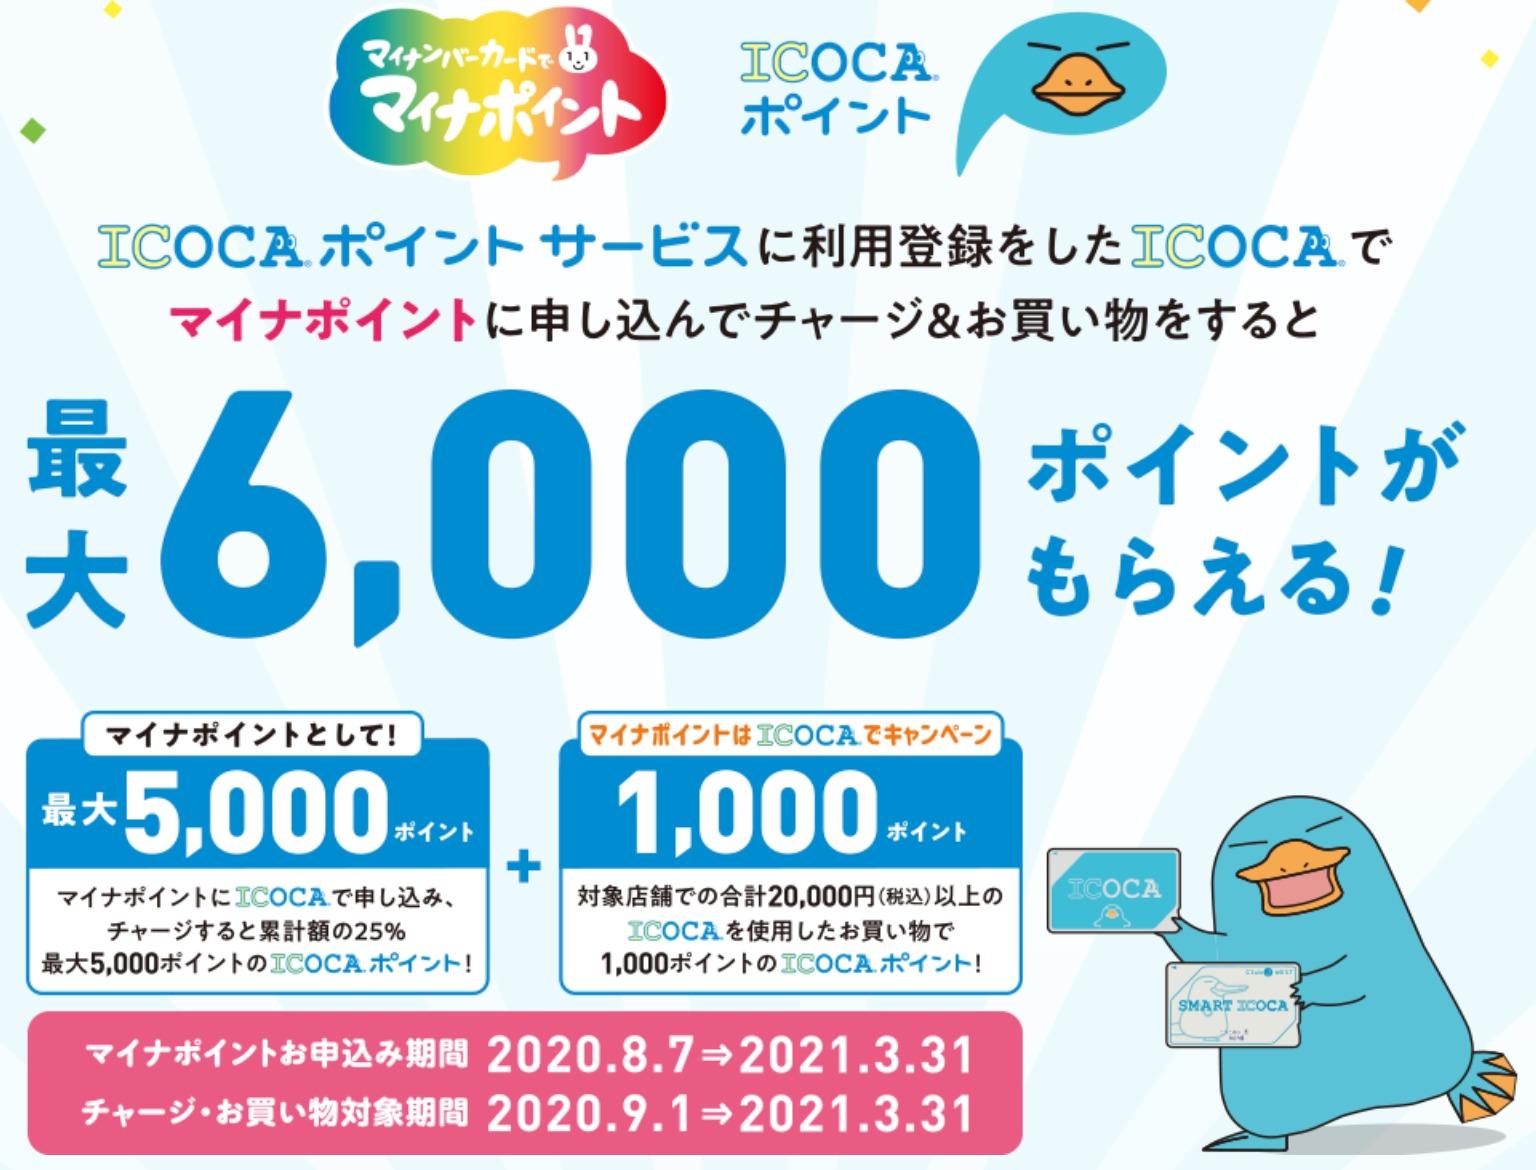 ICOCAキャンペーンの図